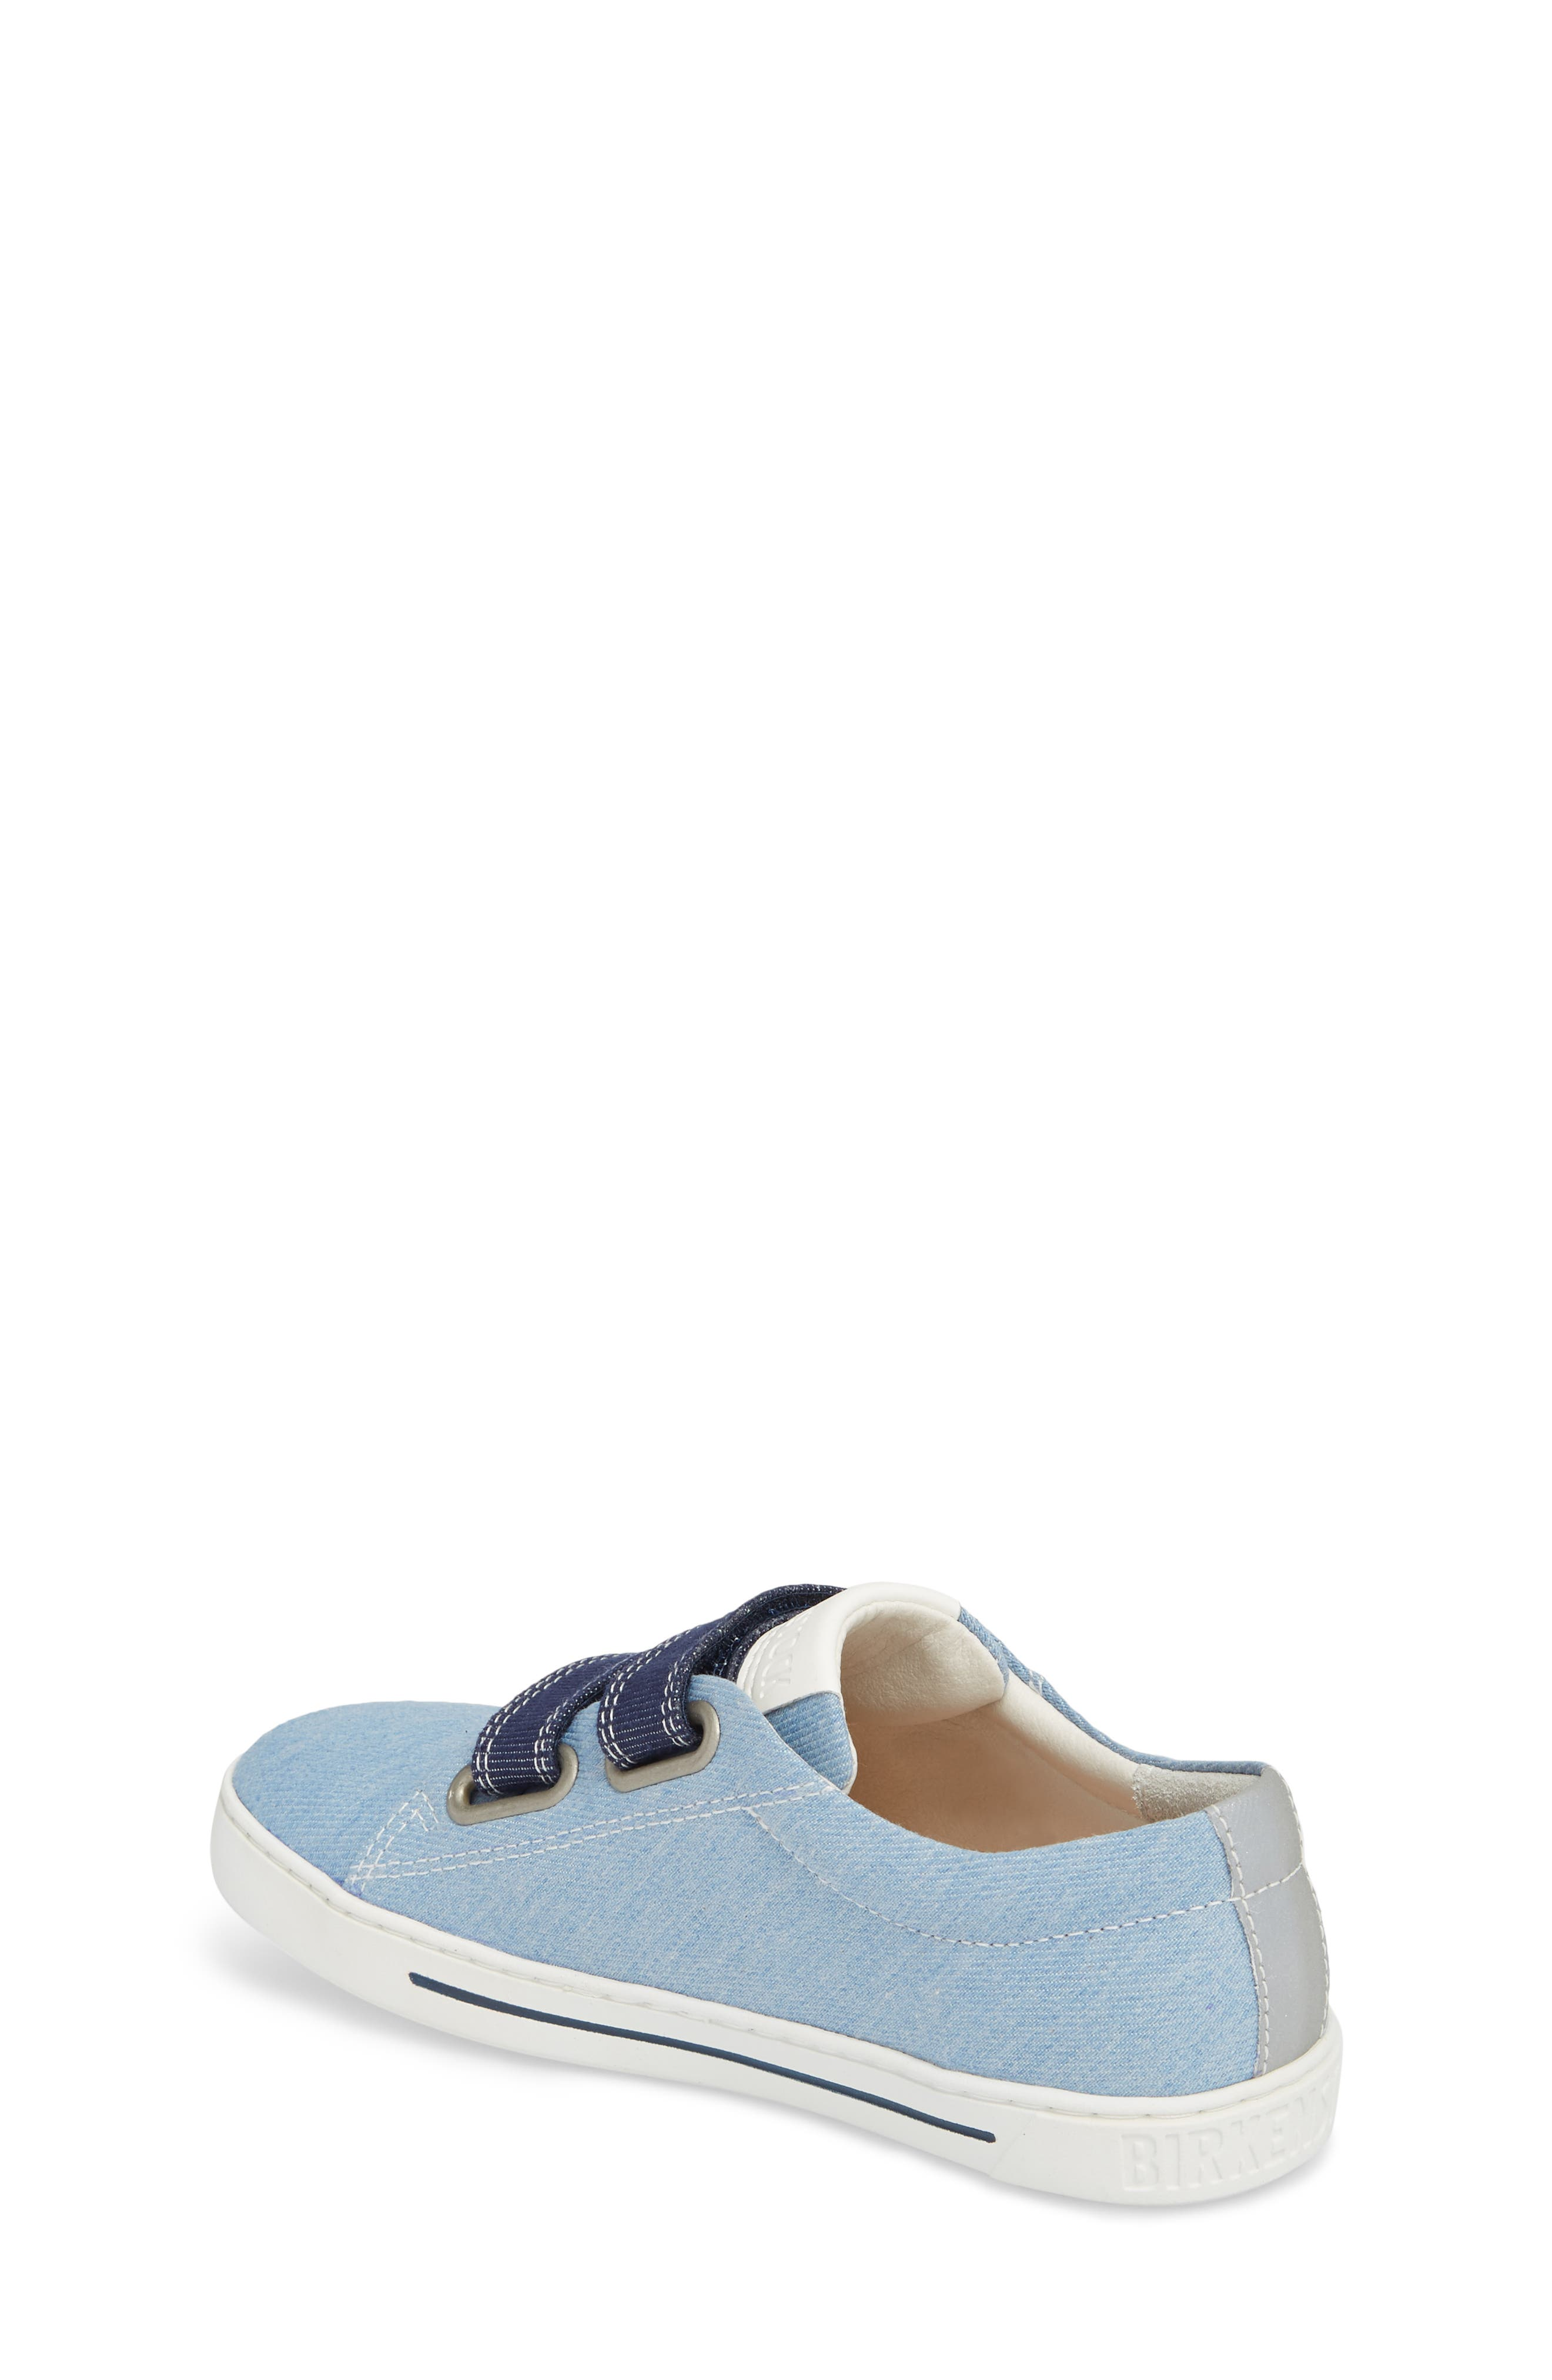 Arran Sneaker,                             Alternate thumbnail 2, color,                             400